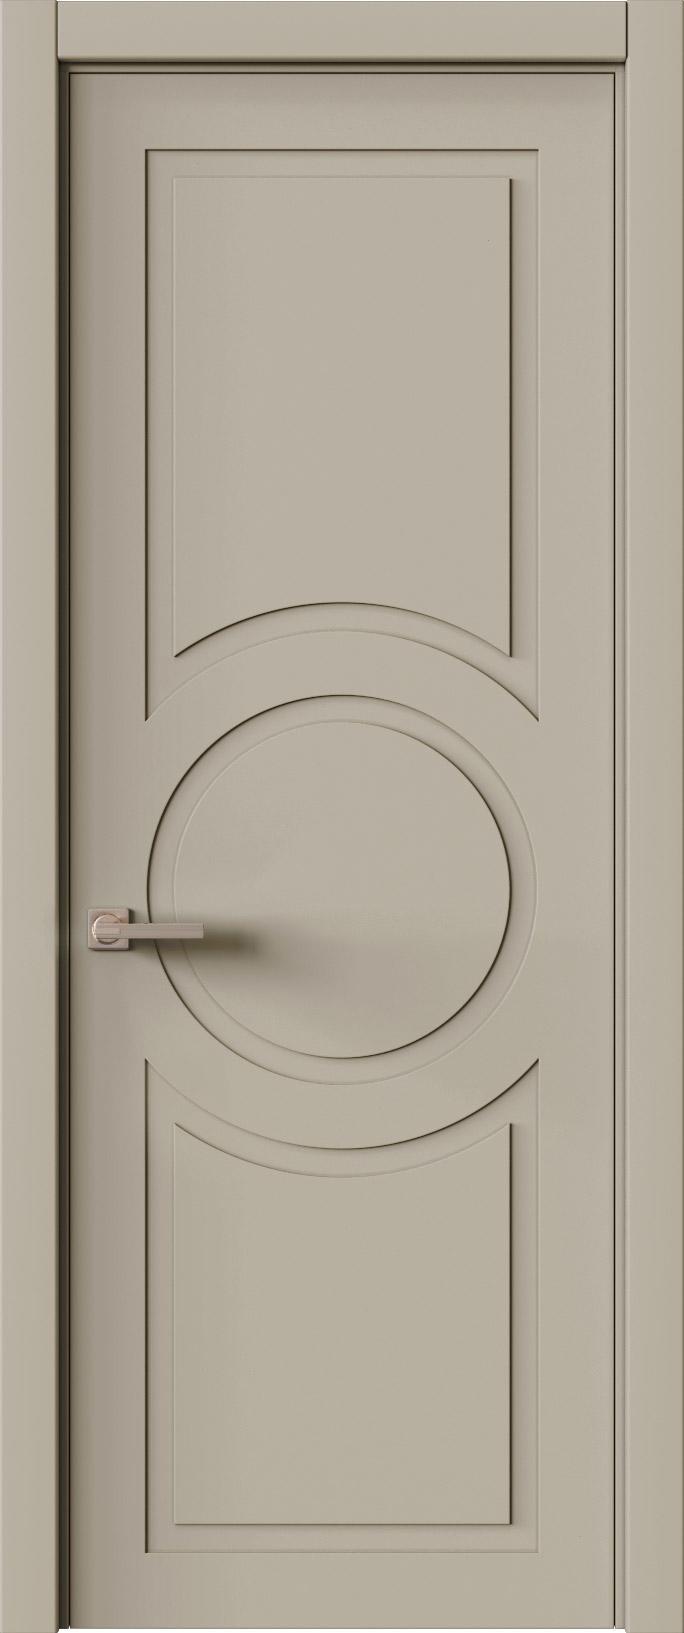 Tivoli М-5 цвет - Серо-оливковая эмаль (RAL 7032) Без стекла (ДГ)